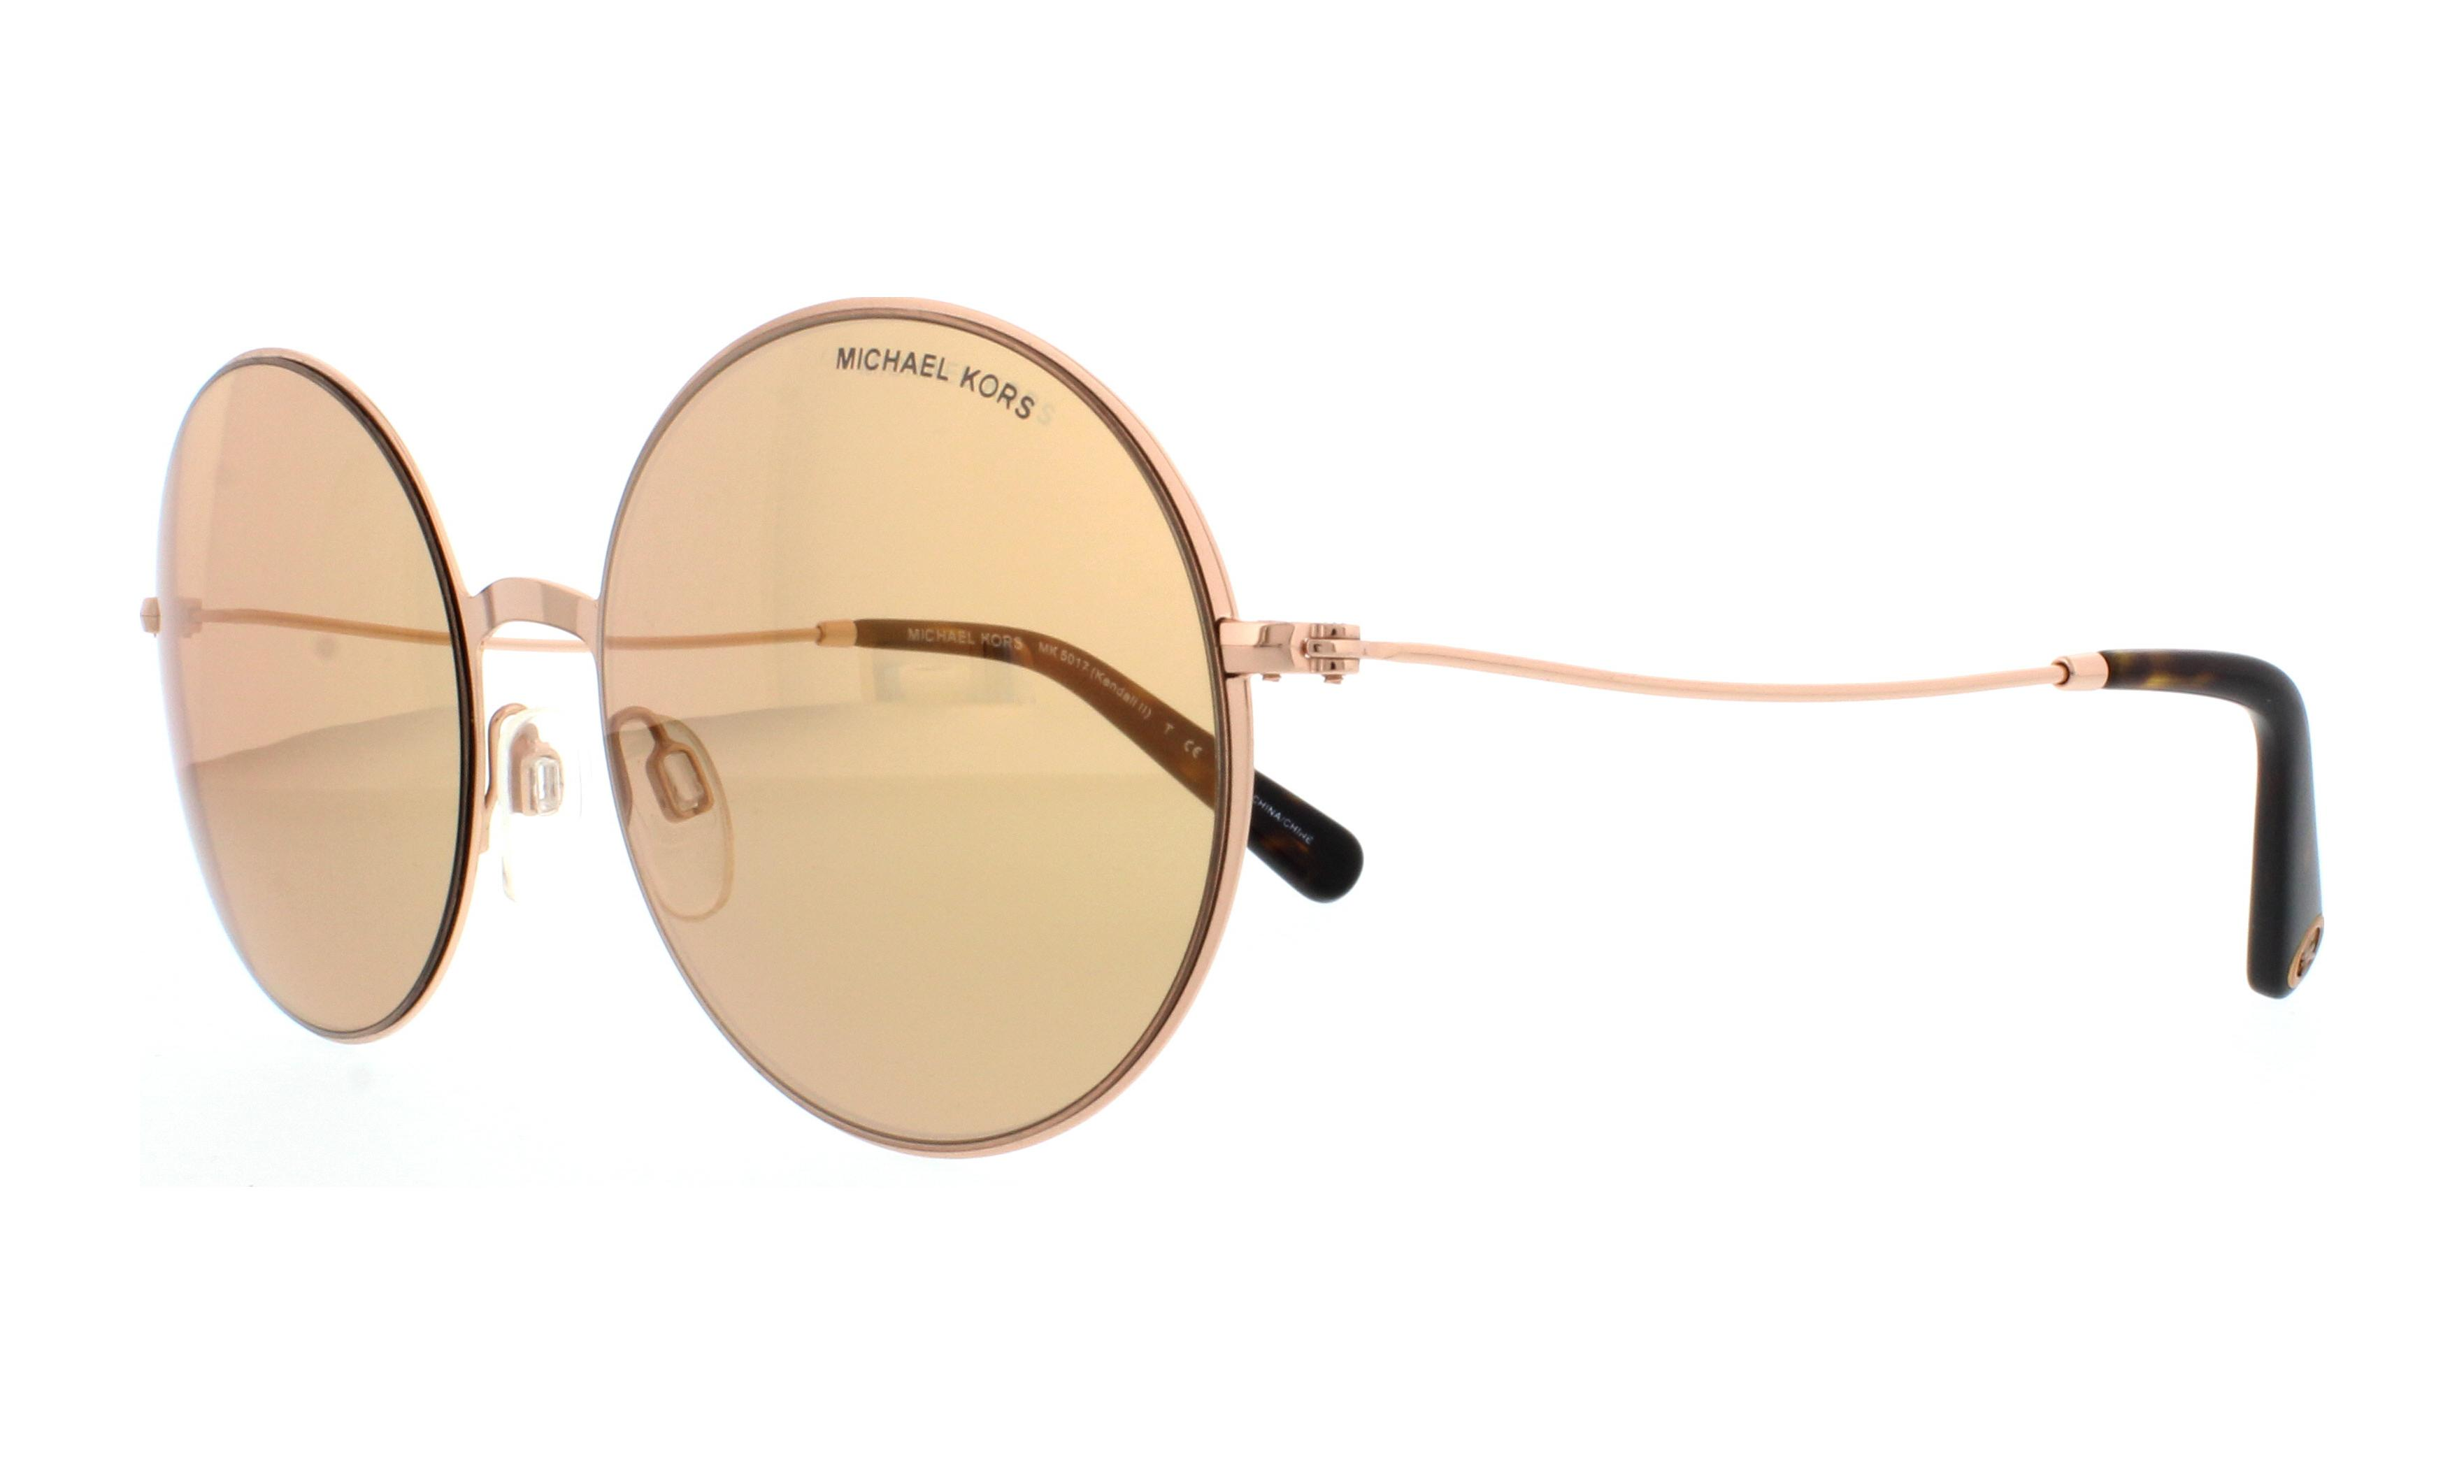 1cb04ce953d9f Michael Kors - Michael Kors Women s Mirrored Kendall Ii MK5017-100125-55  Silver Round Sunglasses - Walmart.com